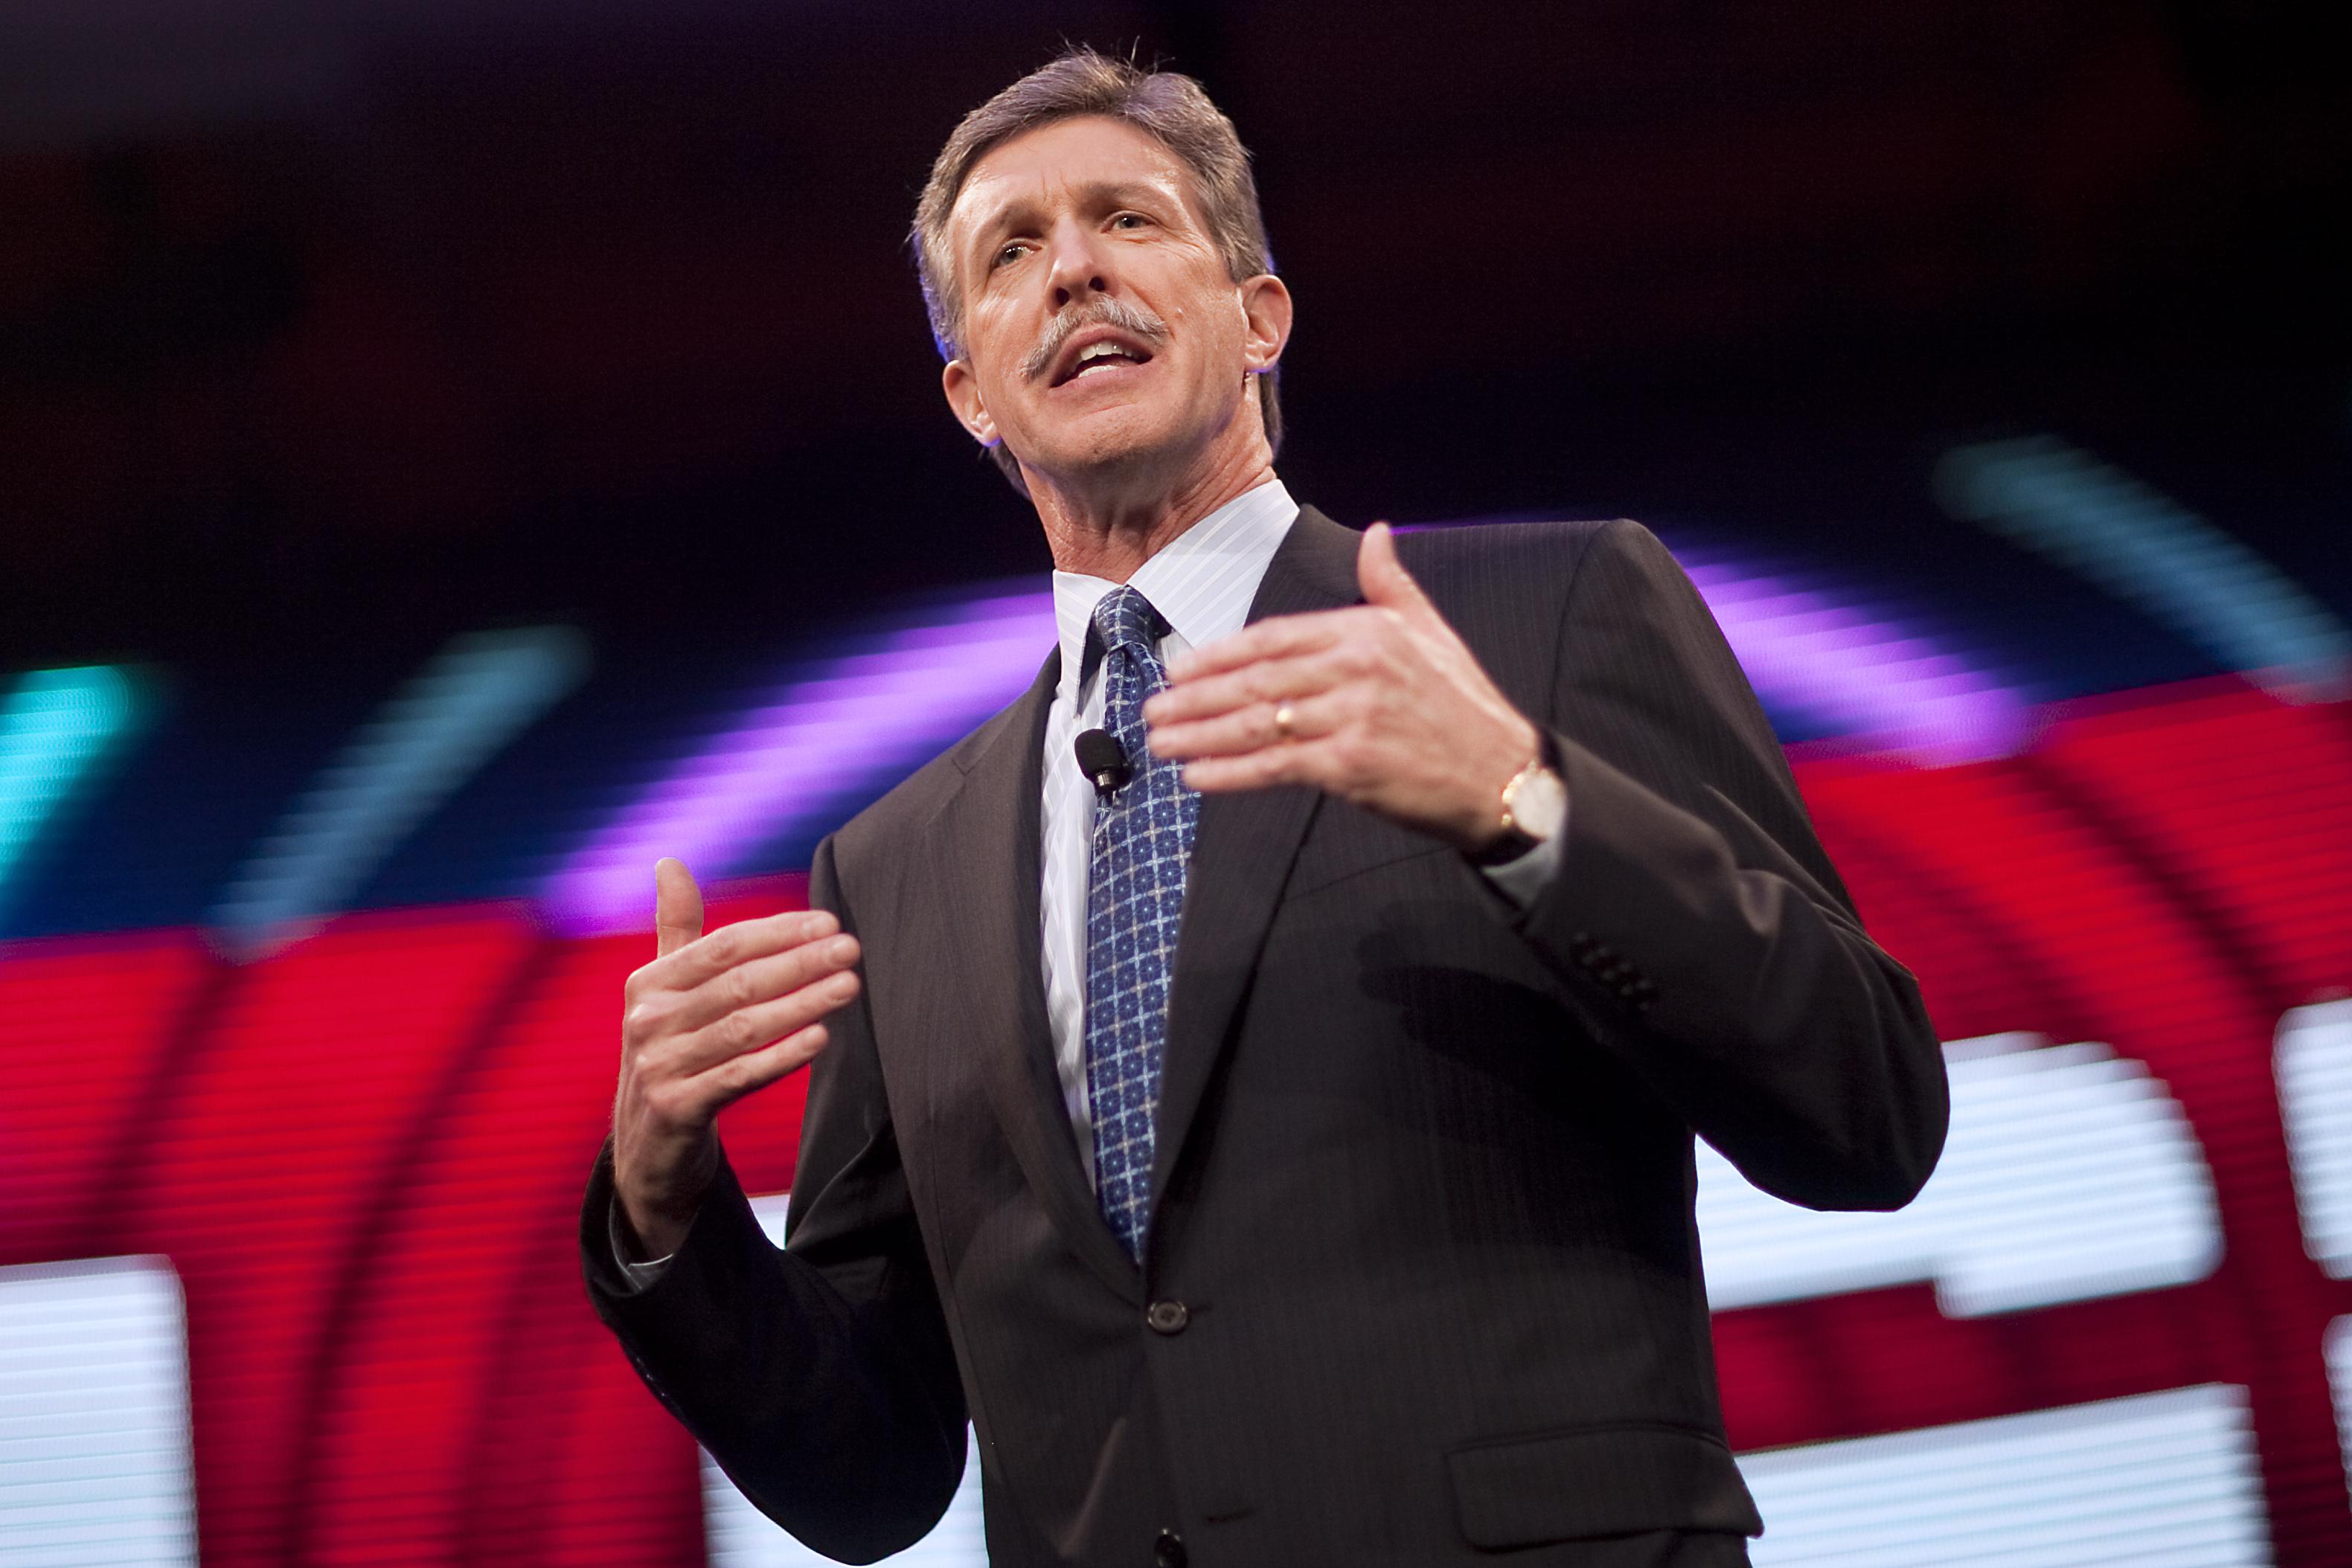 Dan Mead, CEO of Verizon Wireless, is retiring